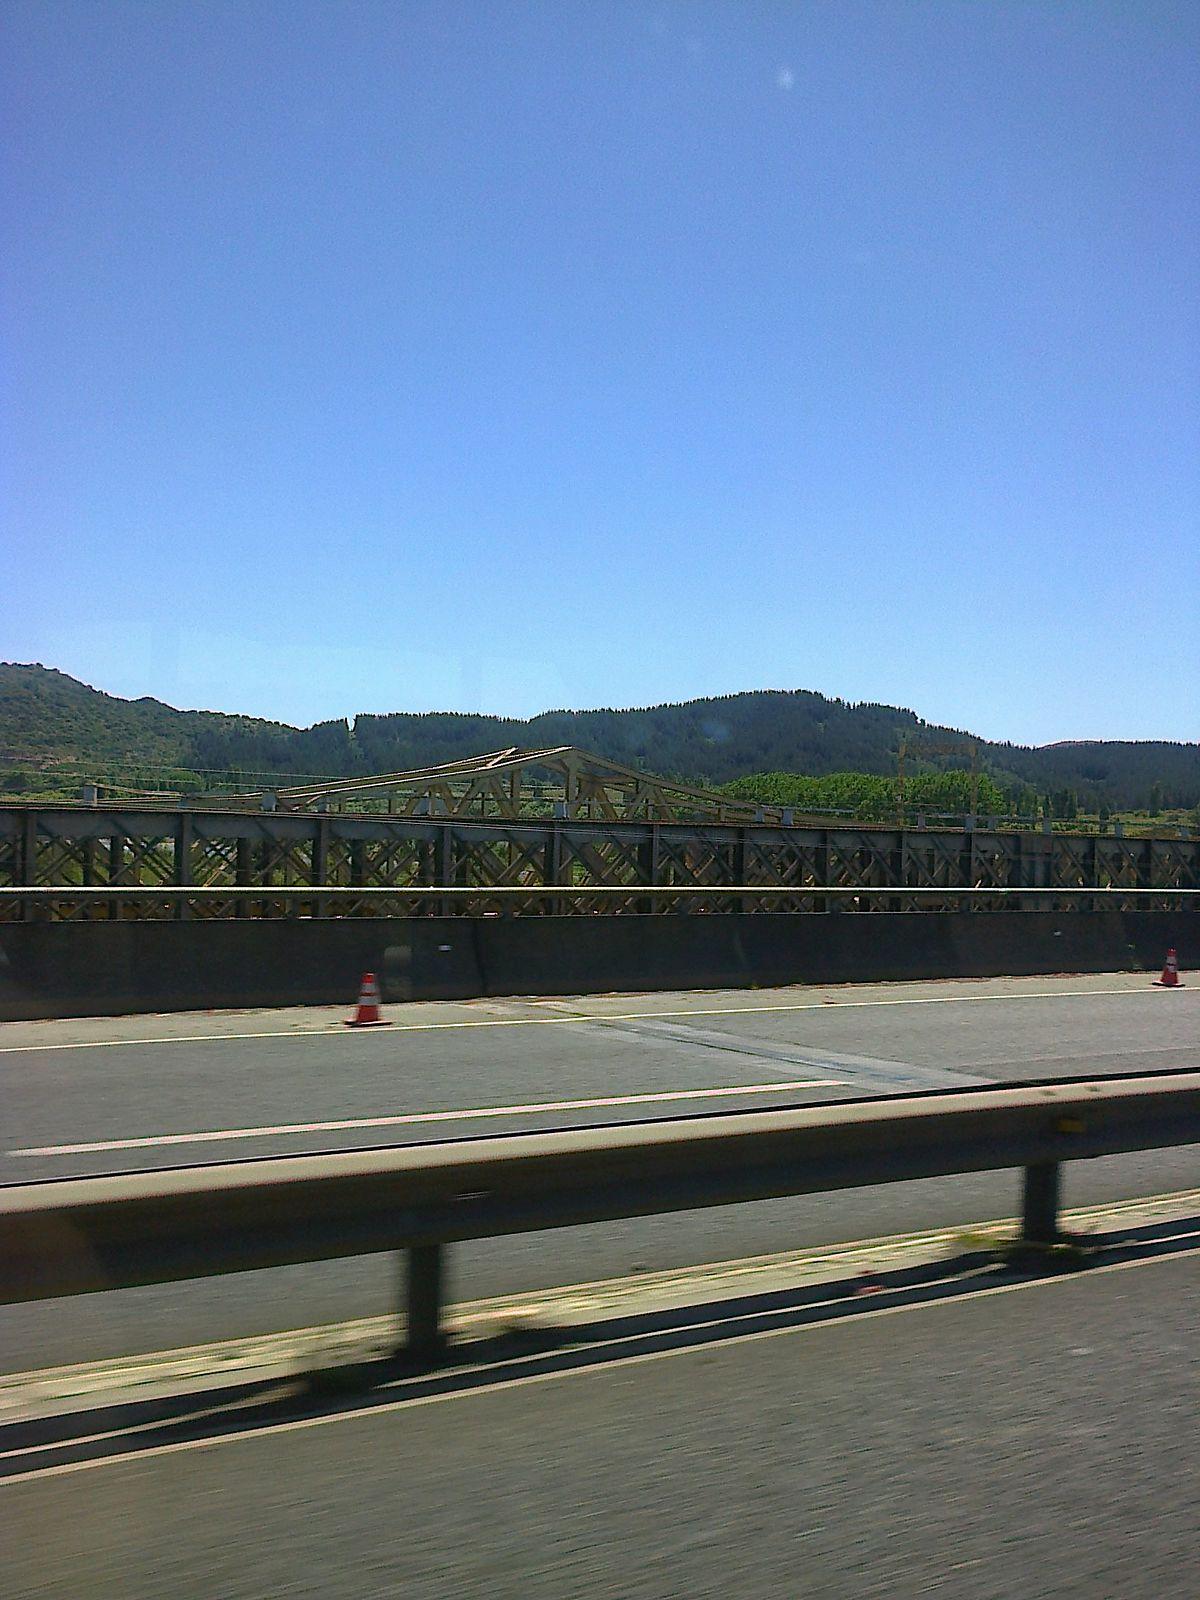 Puente ferroviario Maule - Wikipedia, la enciclopedia libre